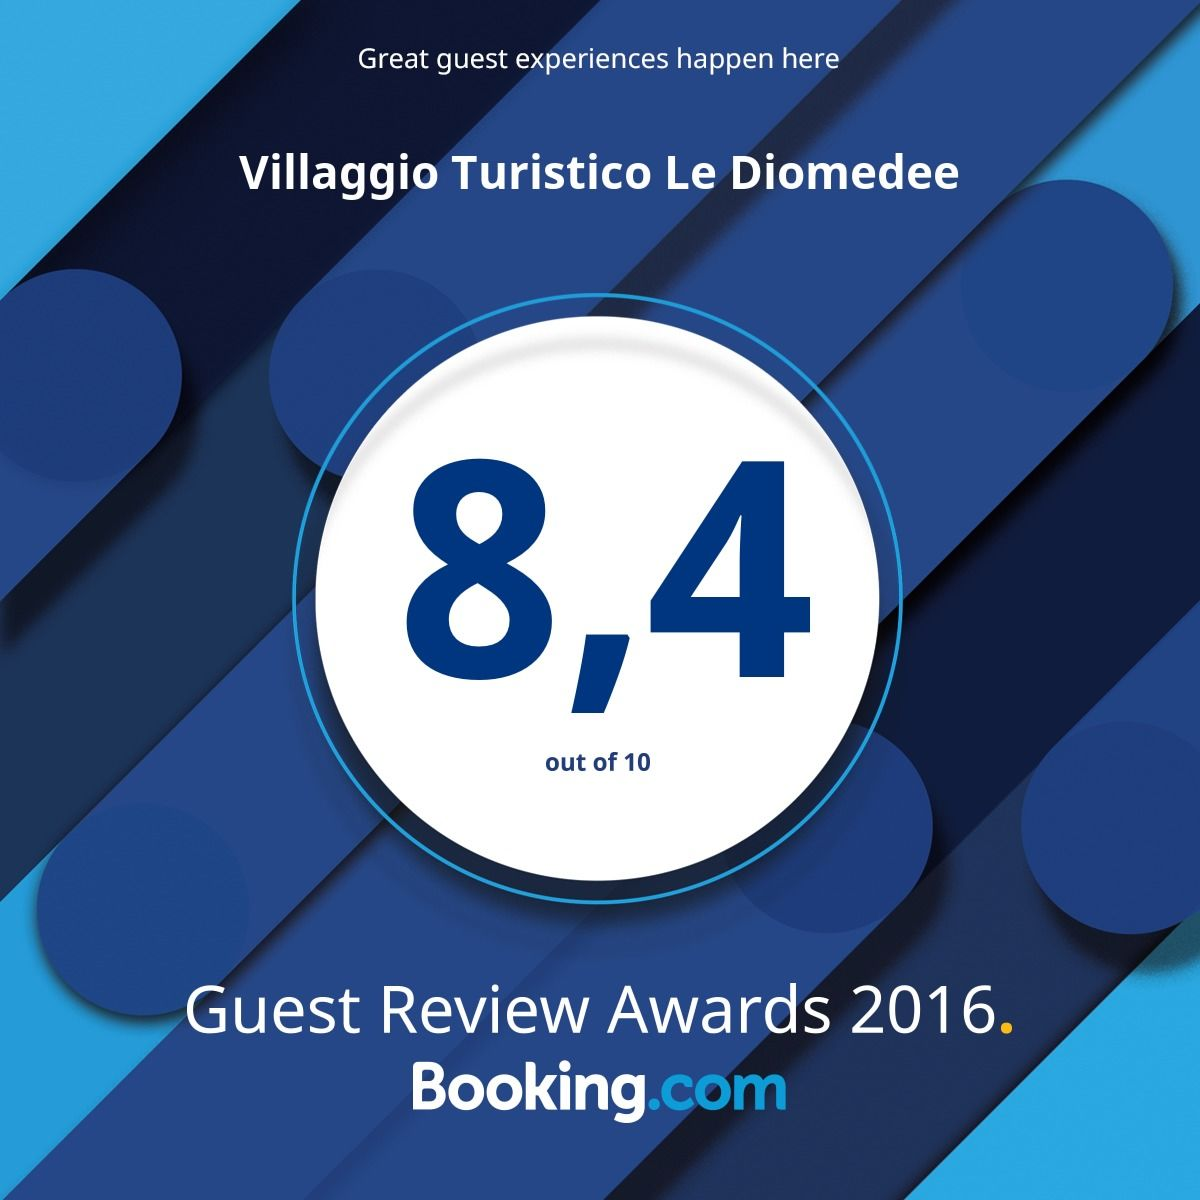 Grazie a tutti i nostri ospiti di @bookingcom per le fantastiche recensioni! #guestsloveus